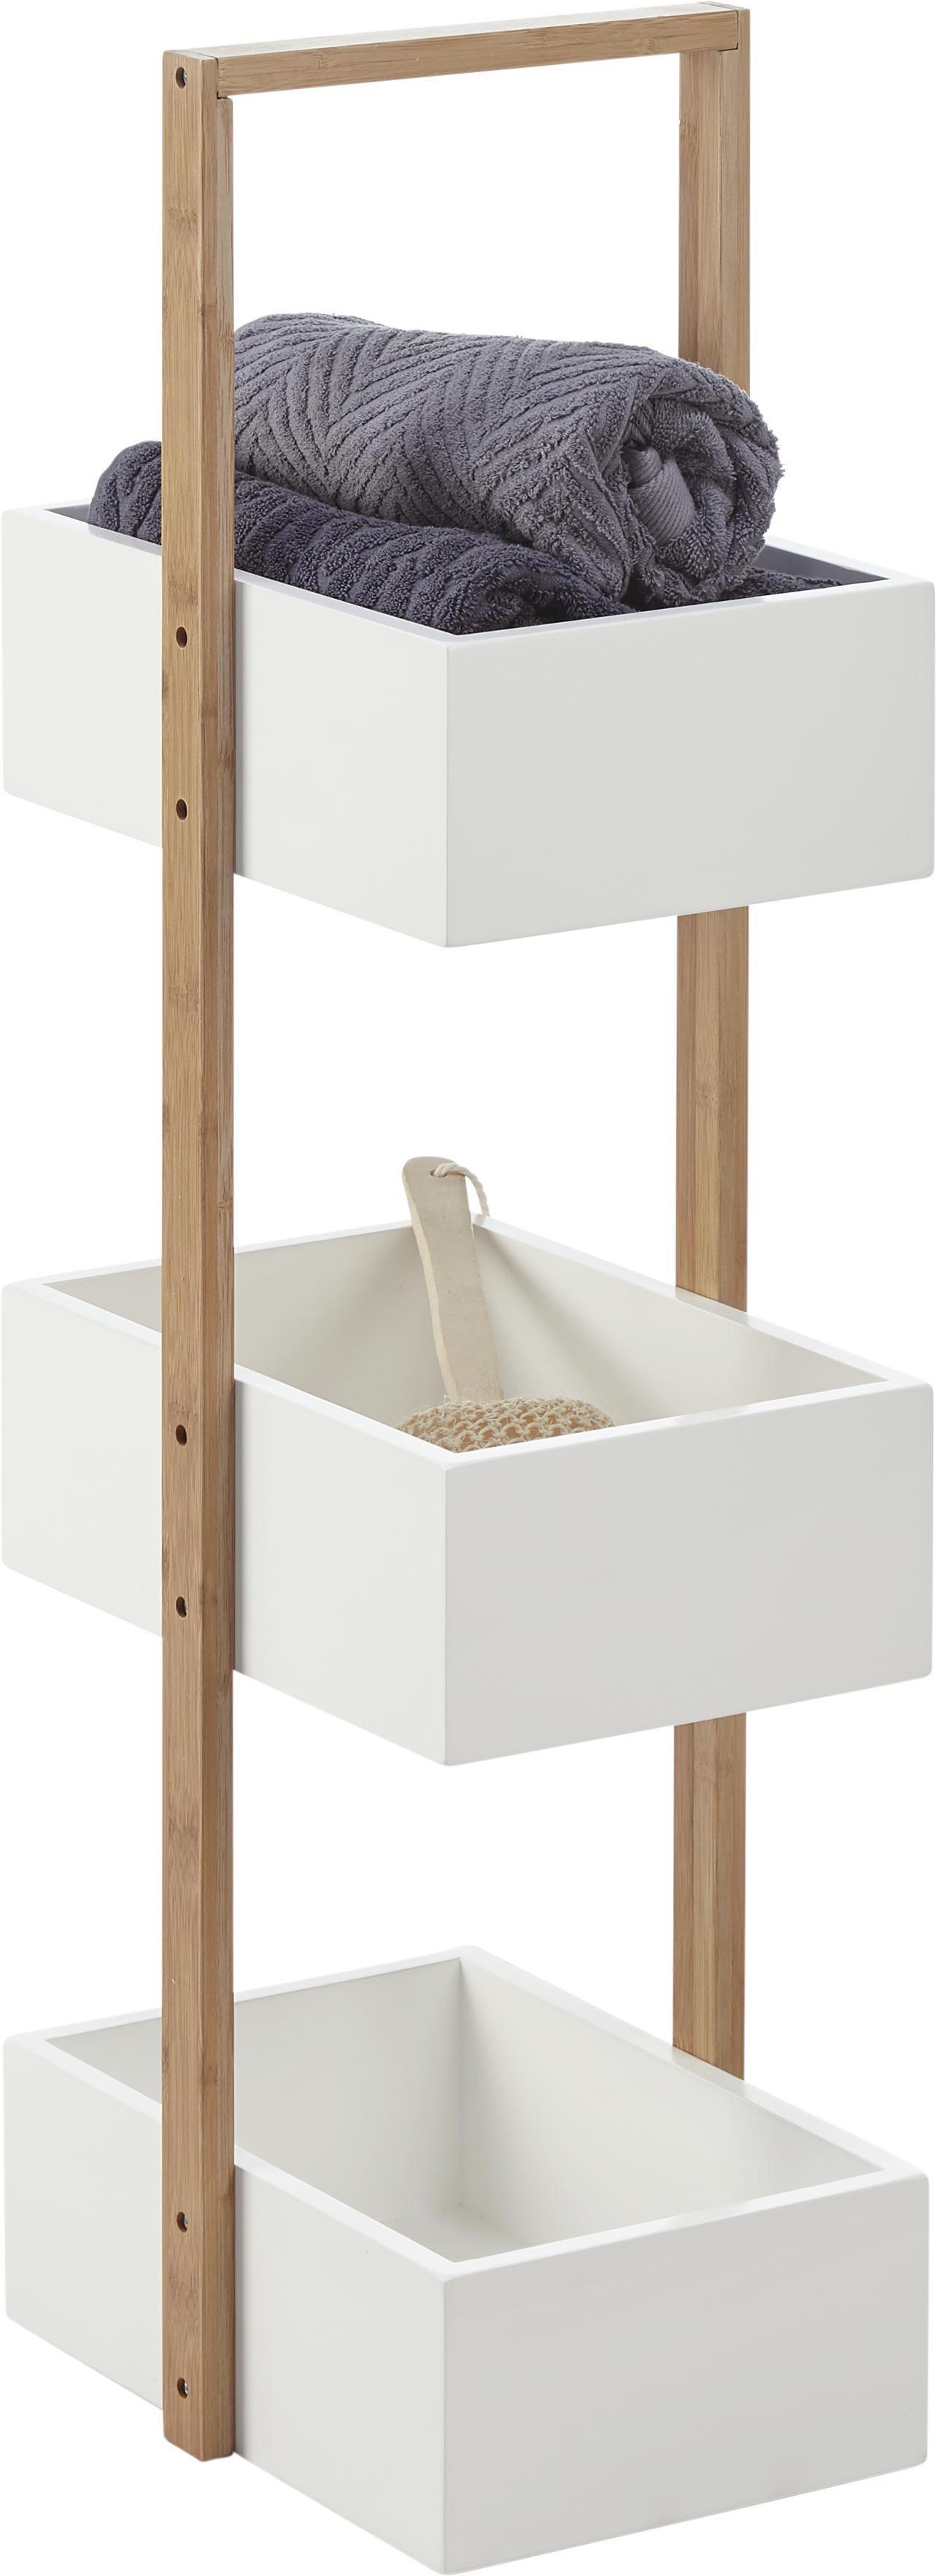 Badezimmerregal Mirella online kaufen ➤ mömax | {Badezimmer regal 63}